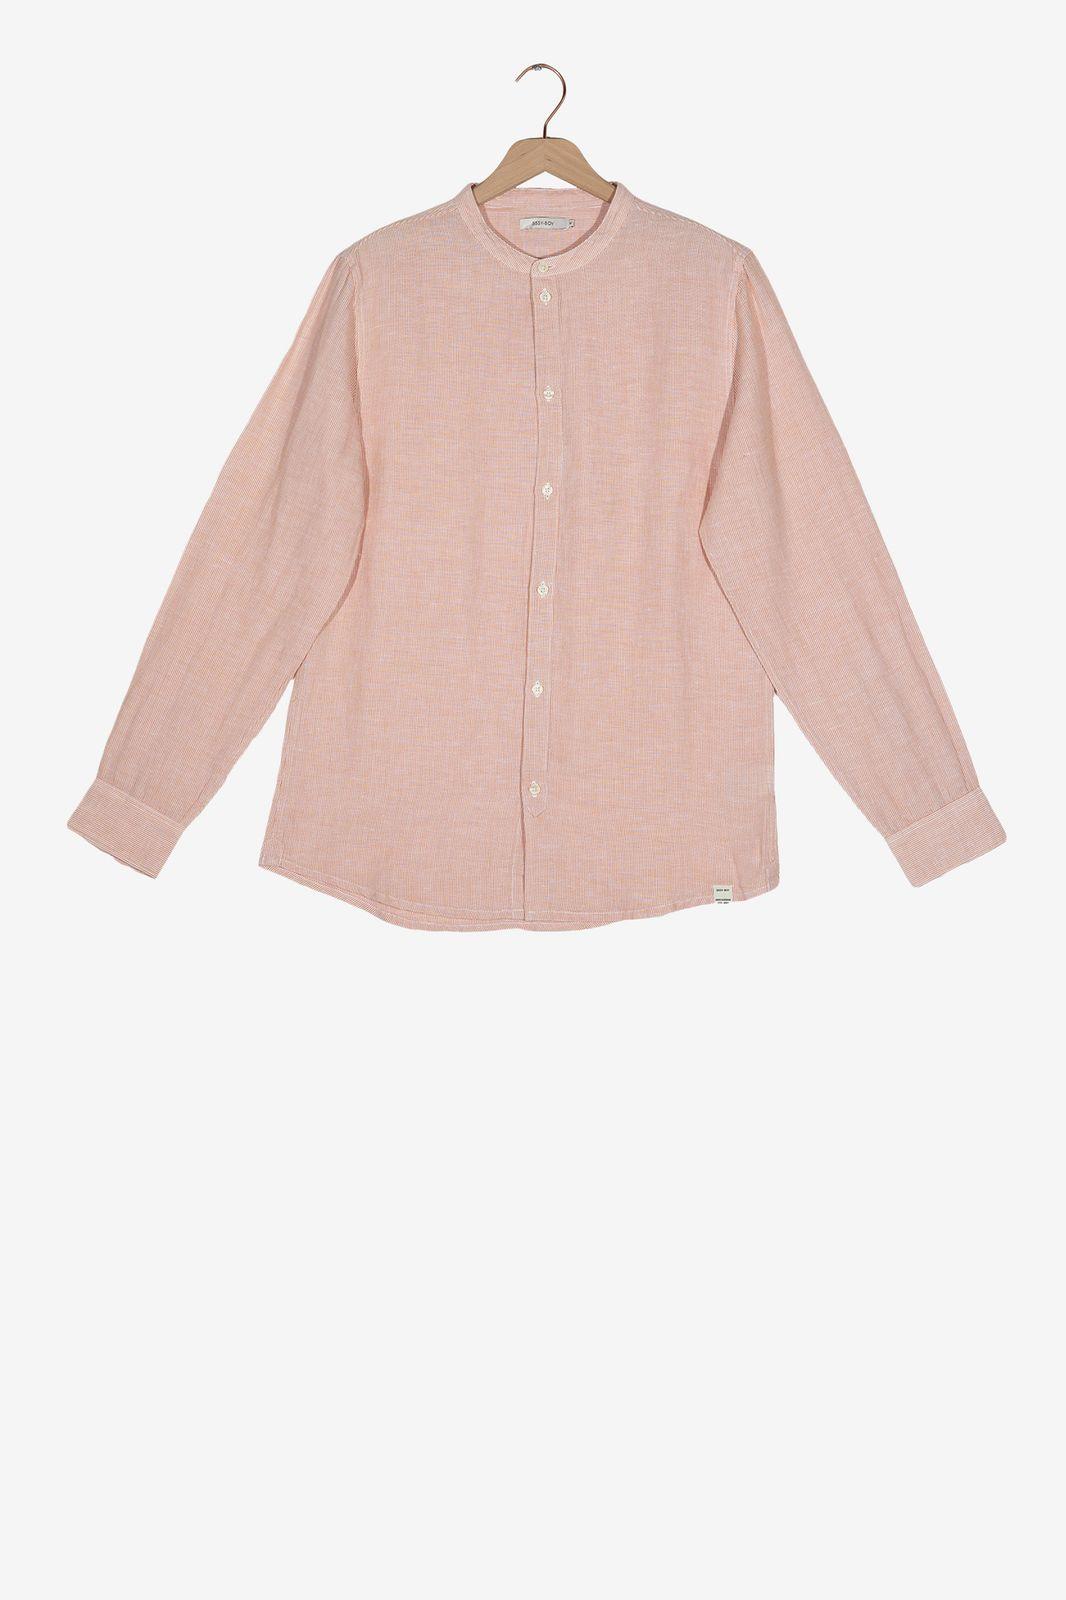 Oranje gestreept overhemd - Heren | Sissy-Boy